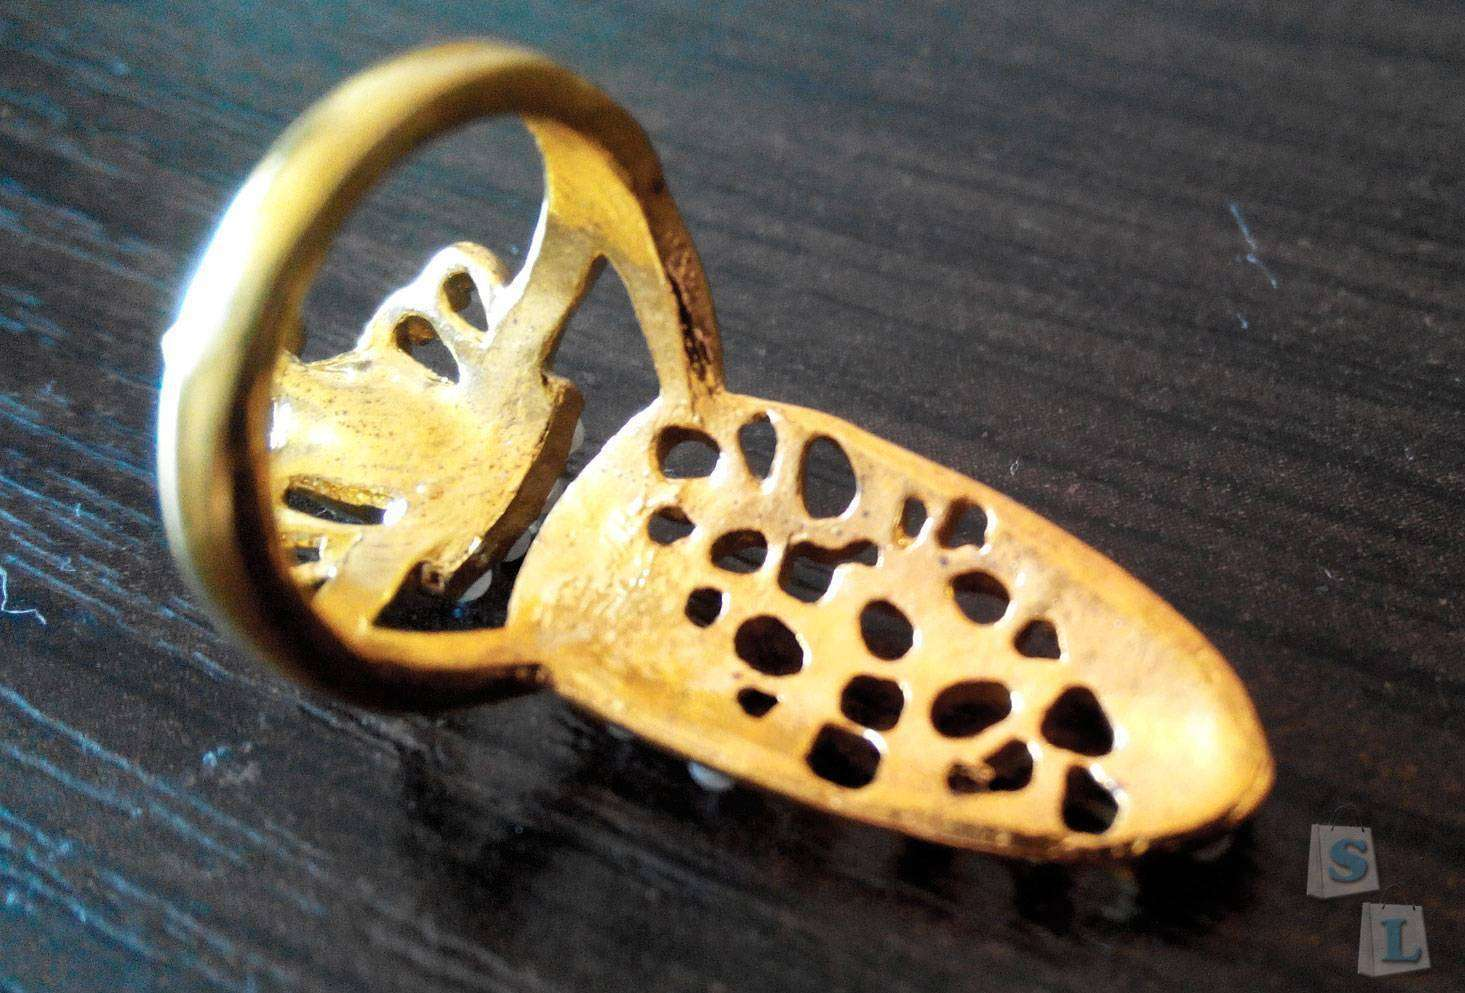 Aliexpress: Необычного вида колечко (бижутерия)